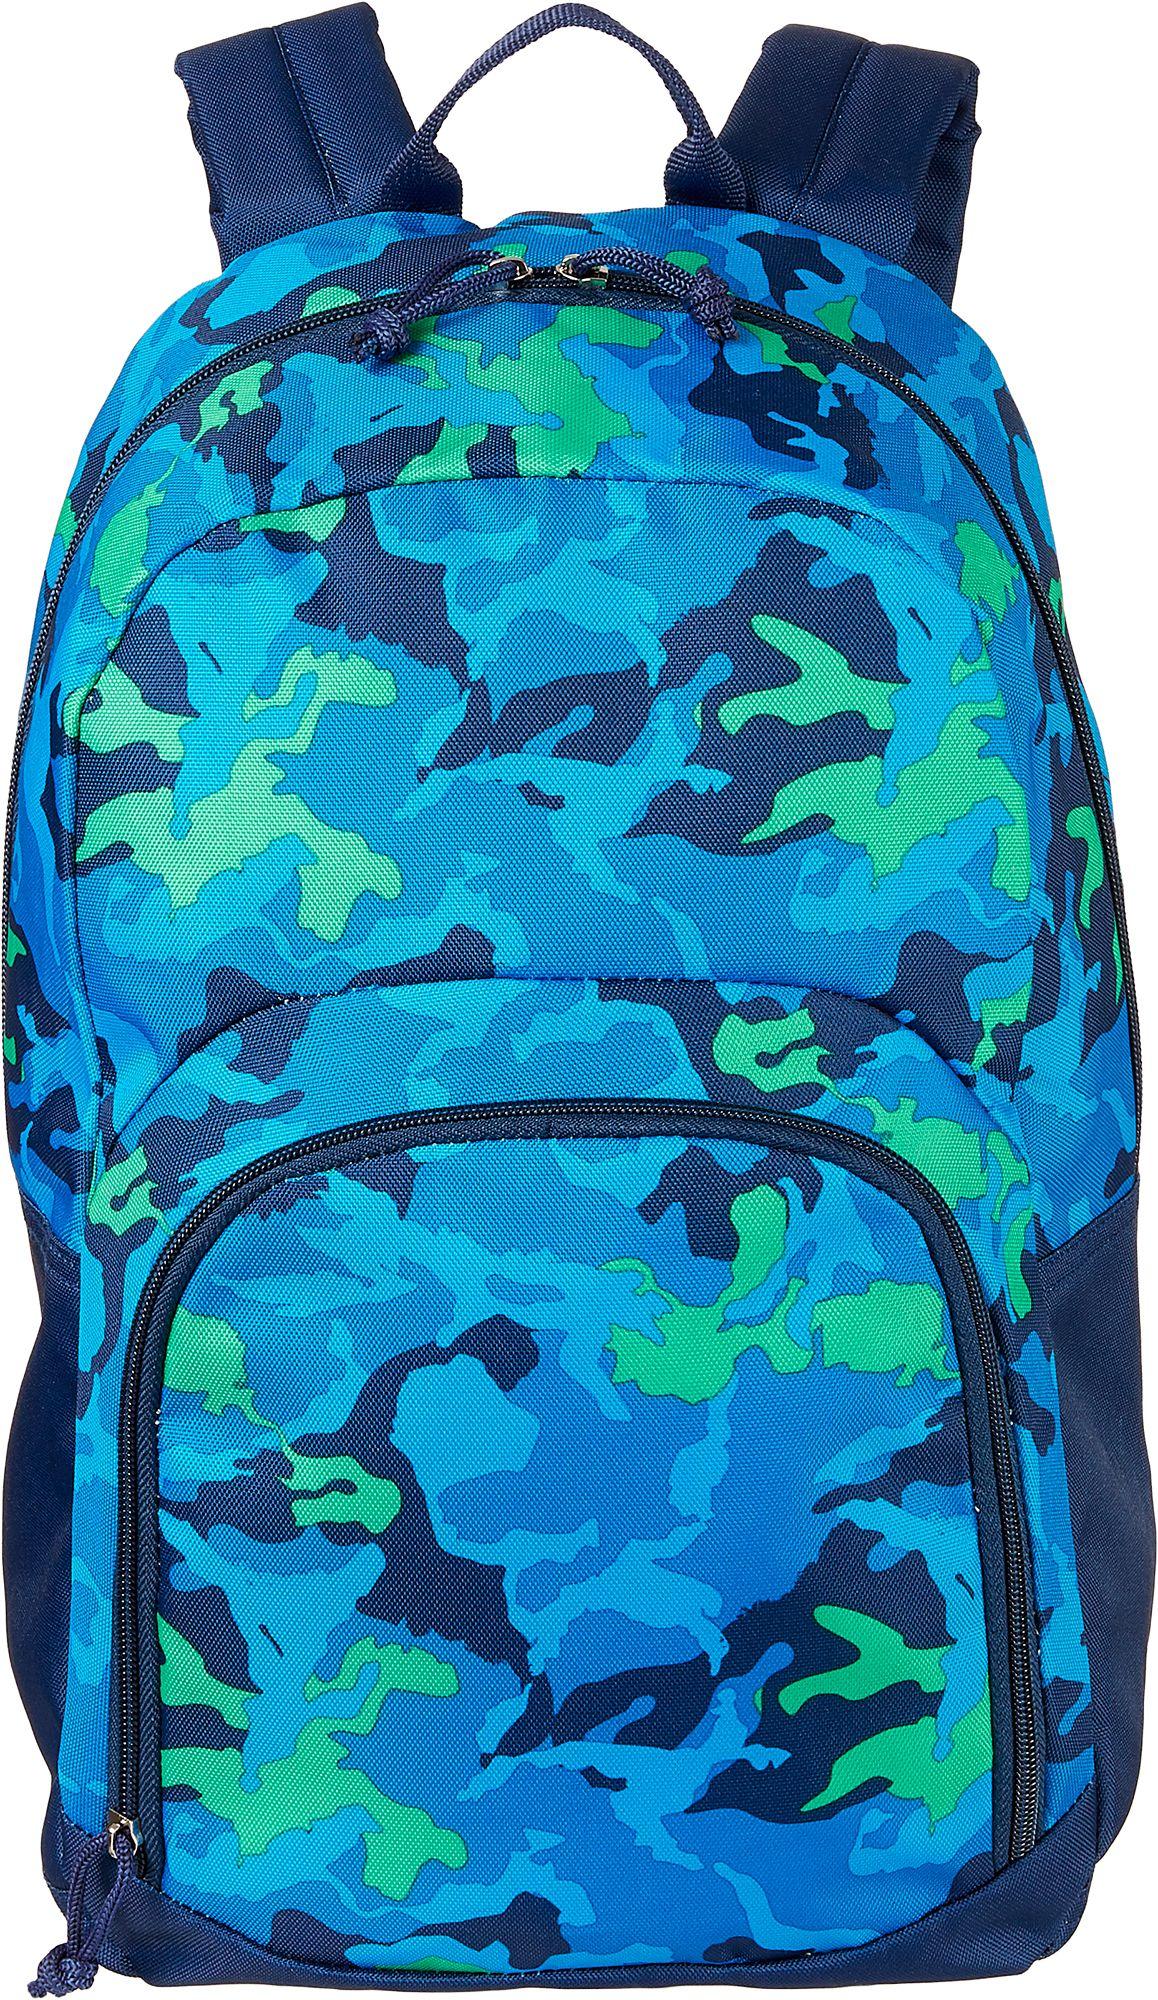 DSG Adventure Backpack, Camo Bright Green